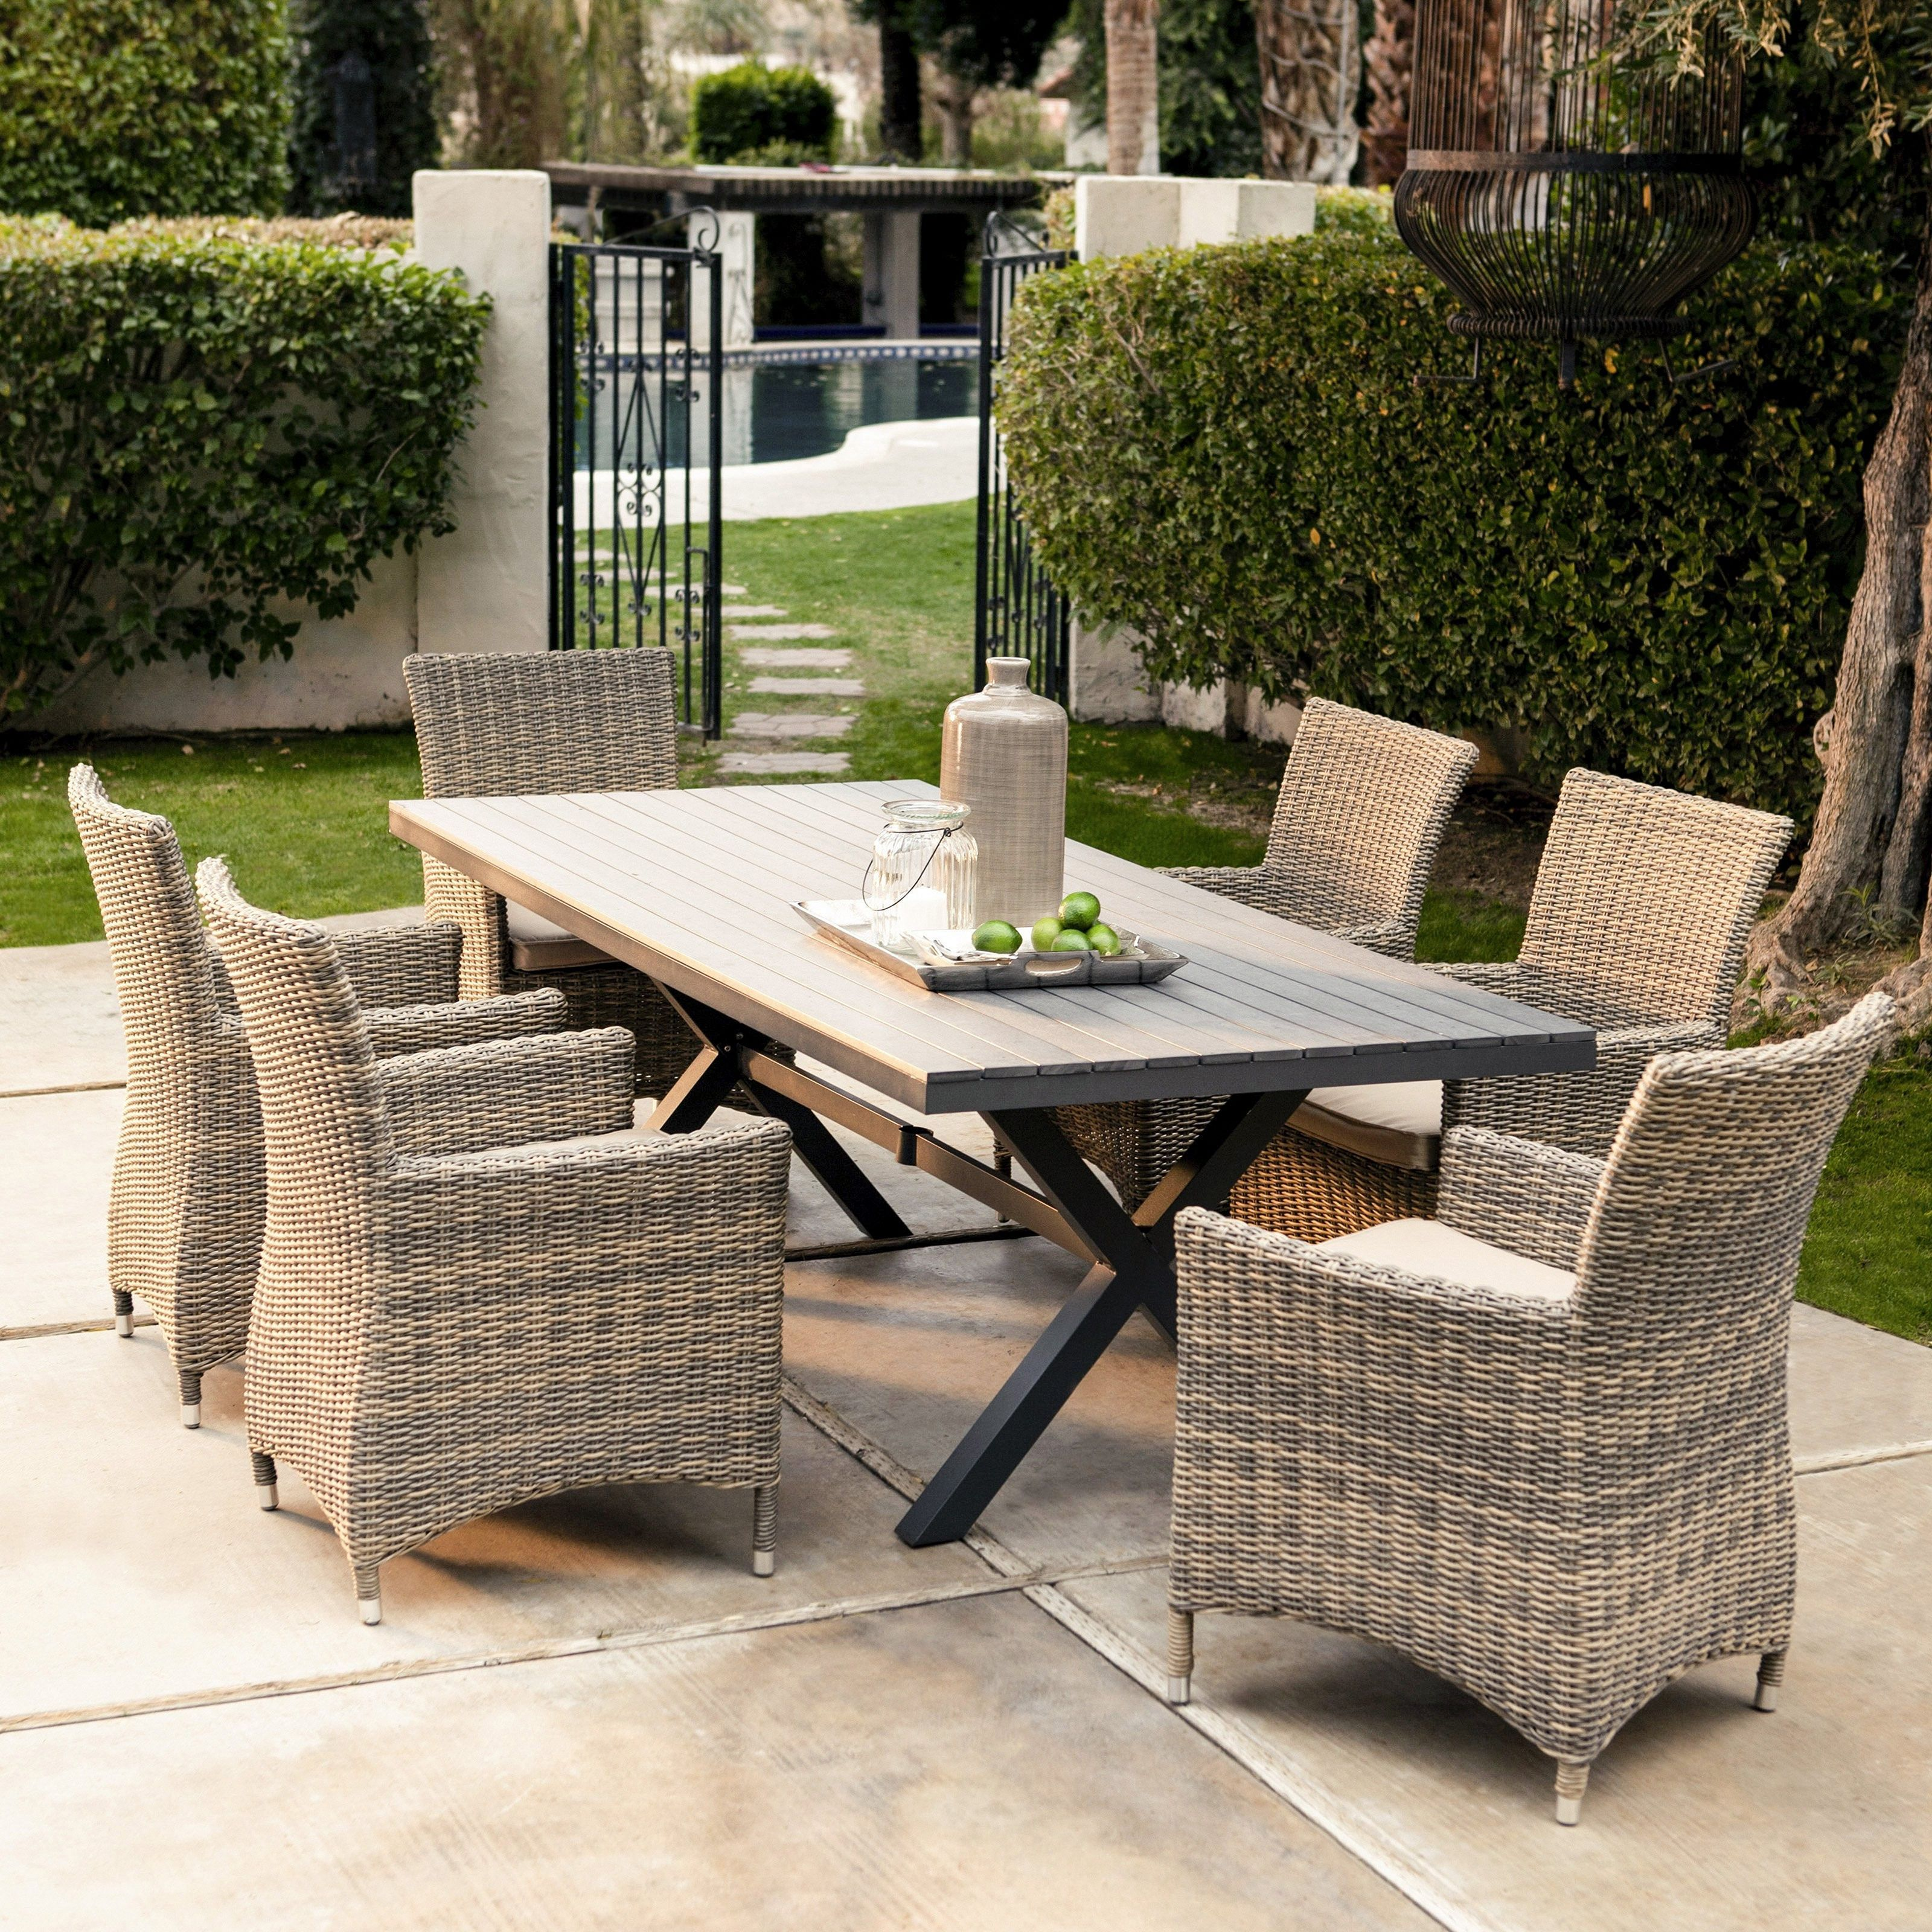 15 minimalist outdoor patio furniture